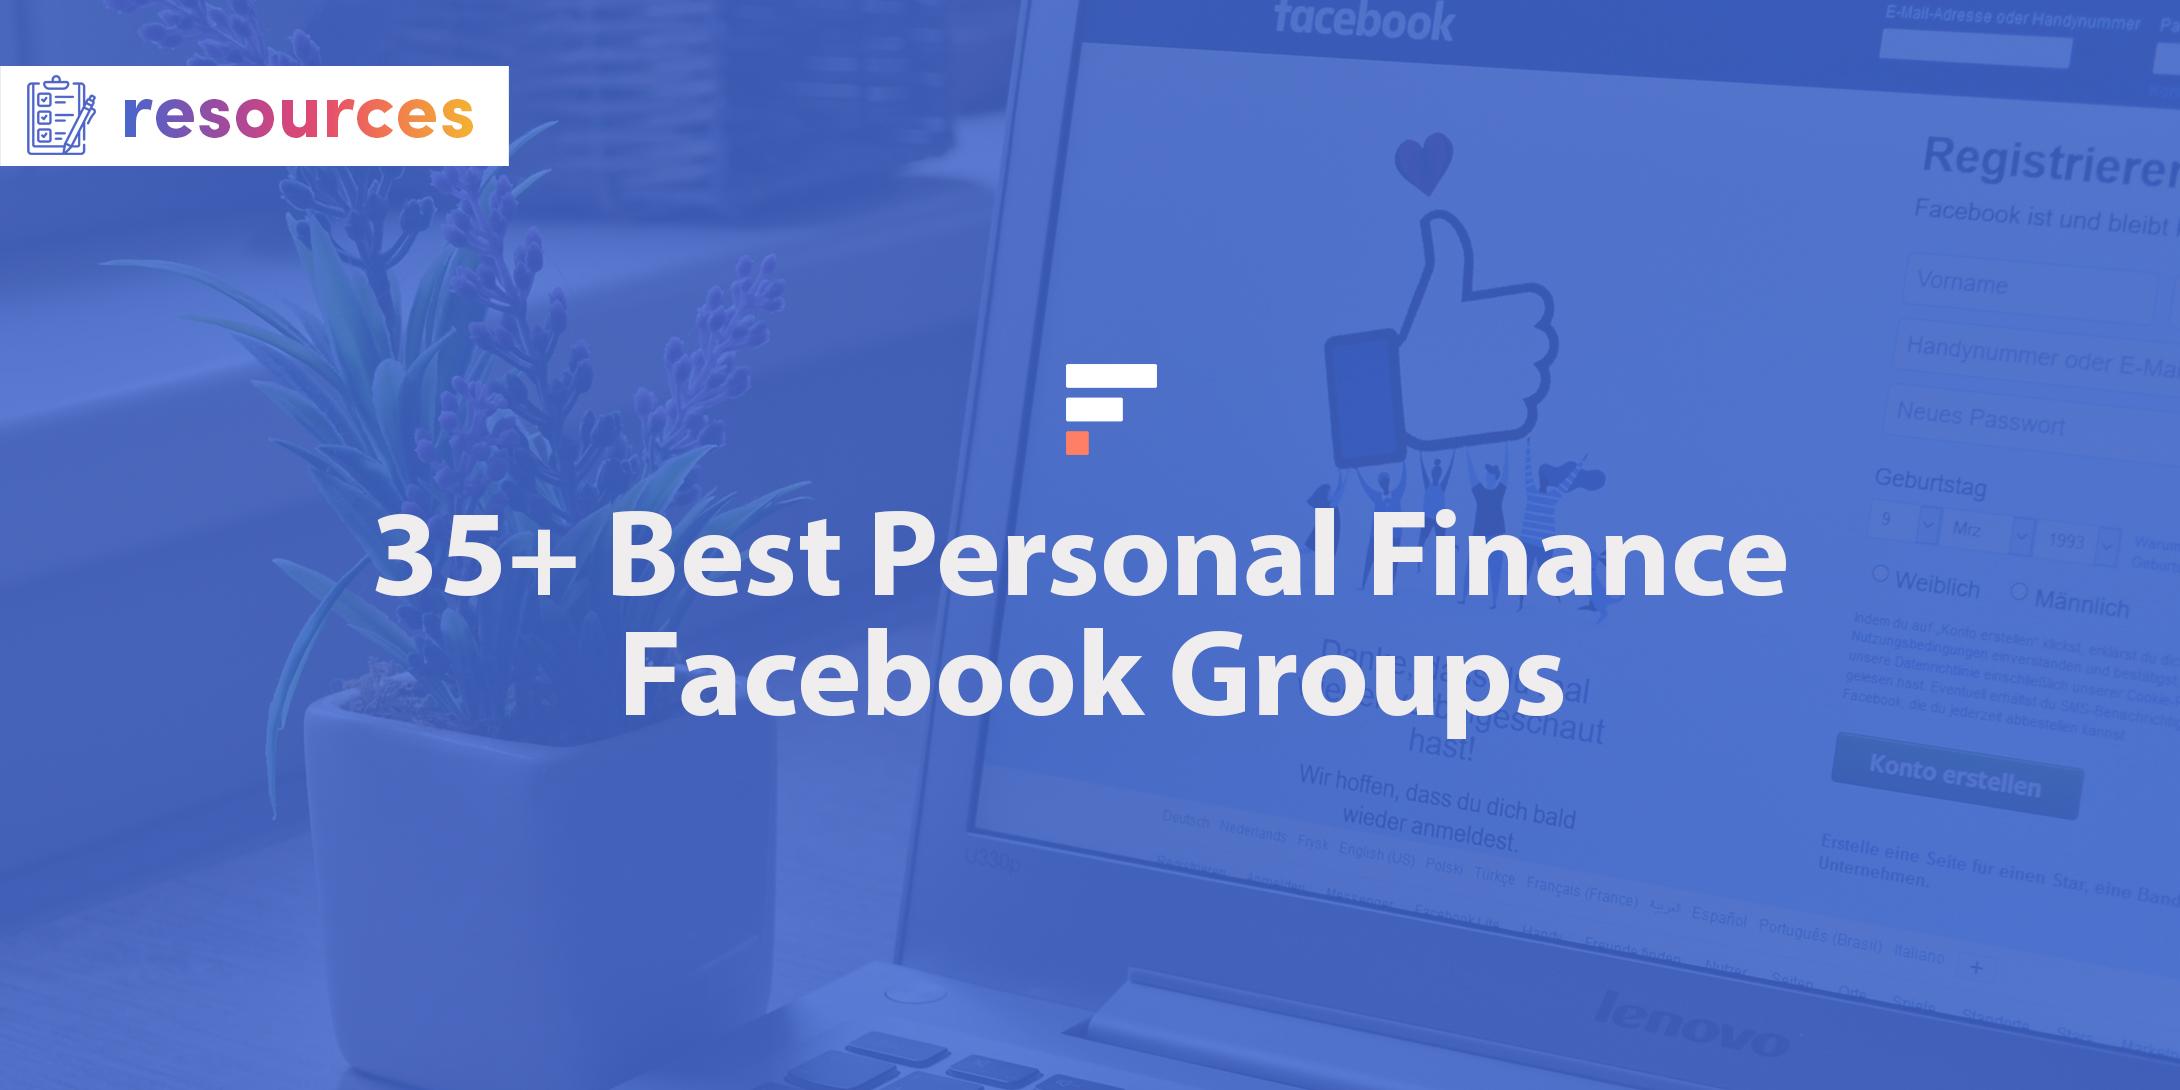 Best personal finance Facebook groups